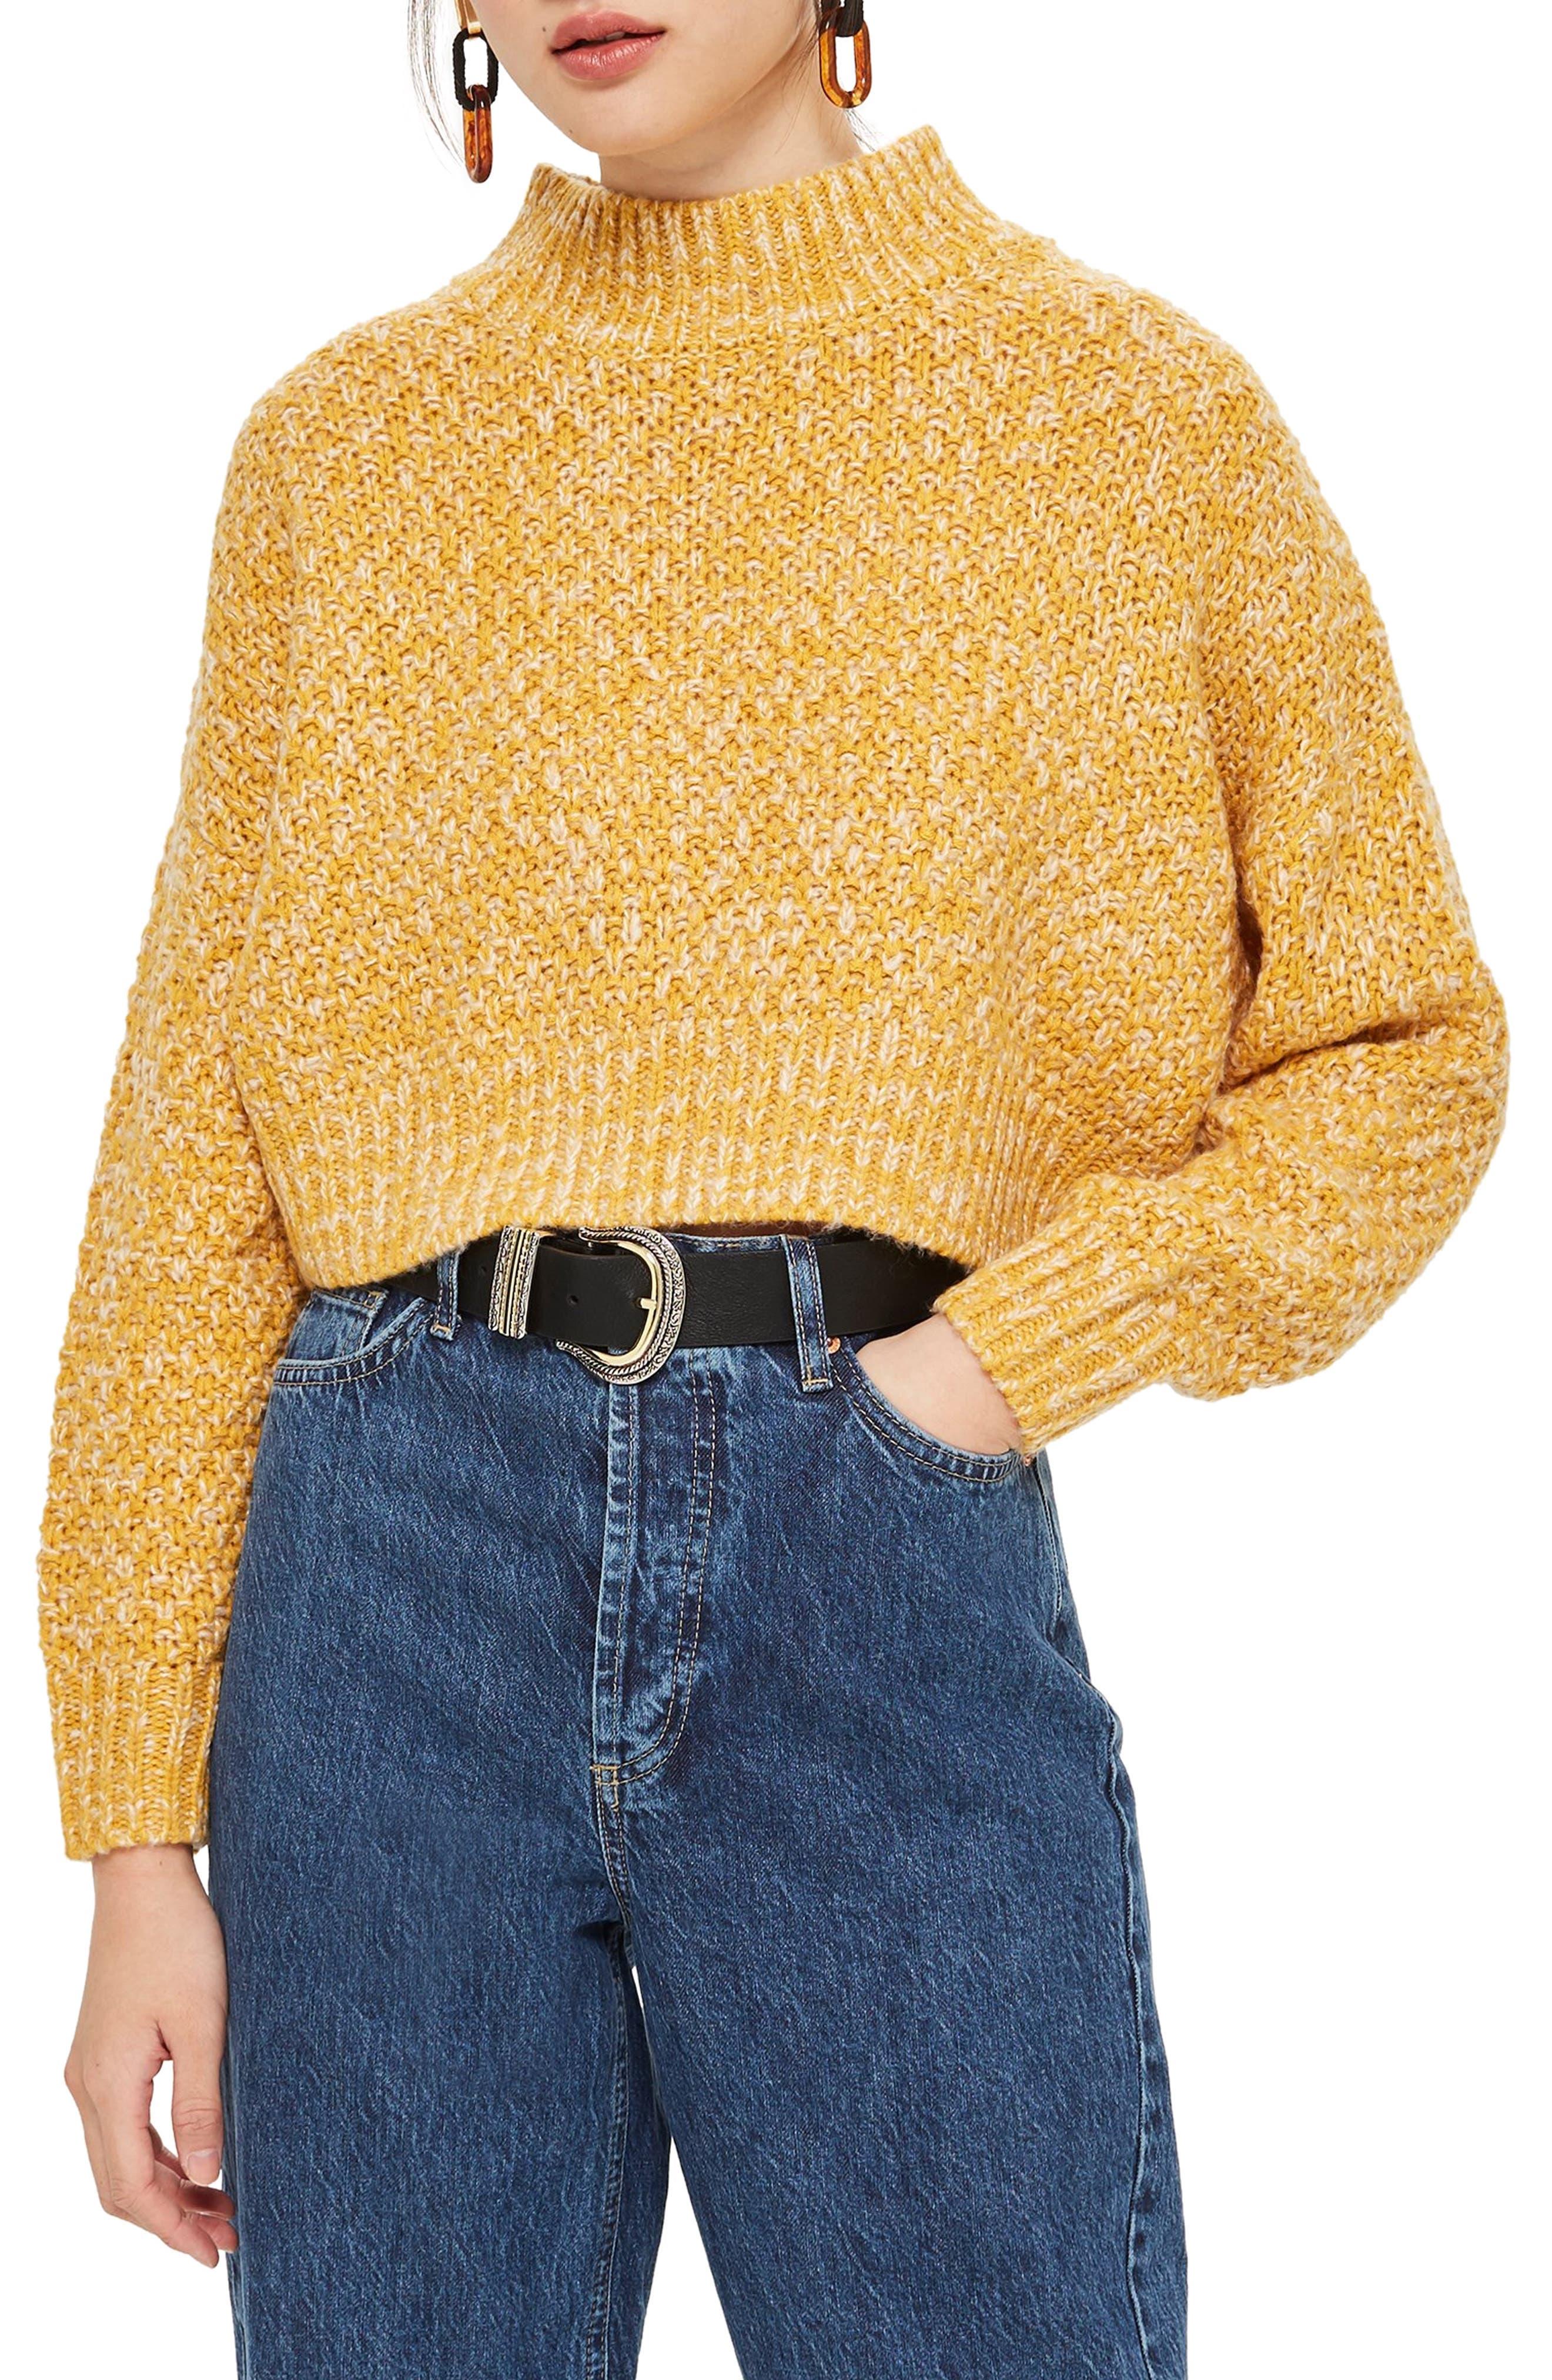 Curve Hem Crop Sweater,                             Main thumbnail 1, color,                             MUSTARD